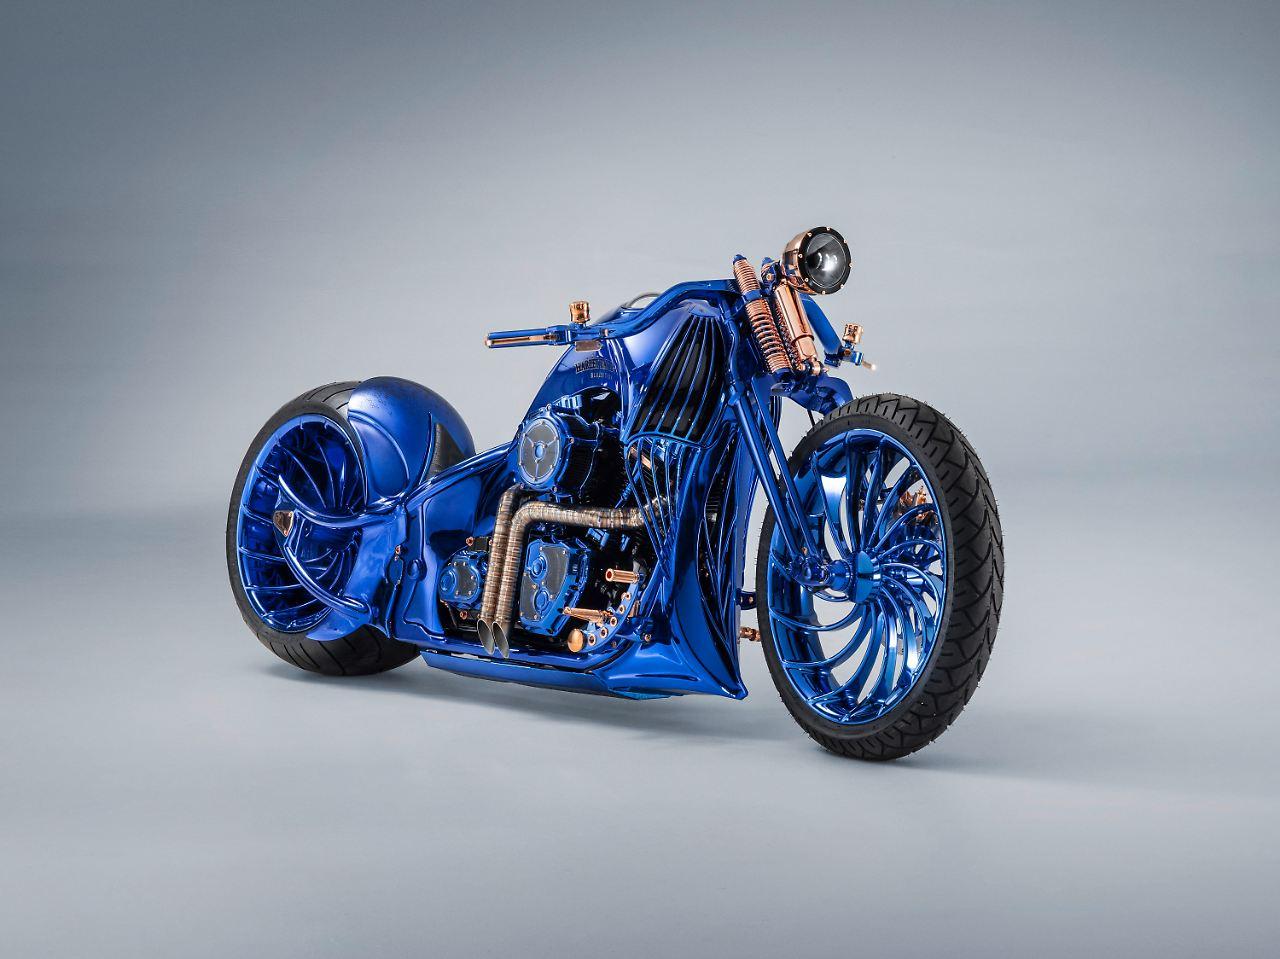 Harley Davidson  Crore Bike